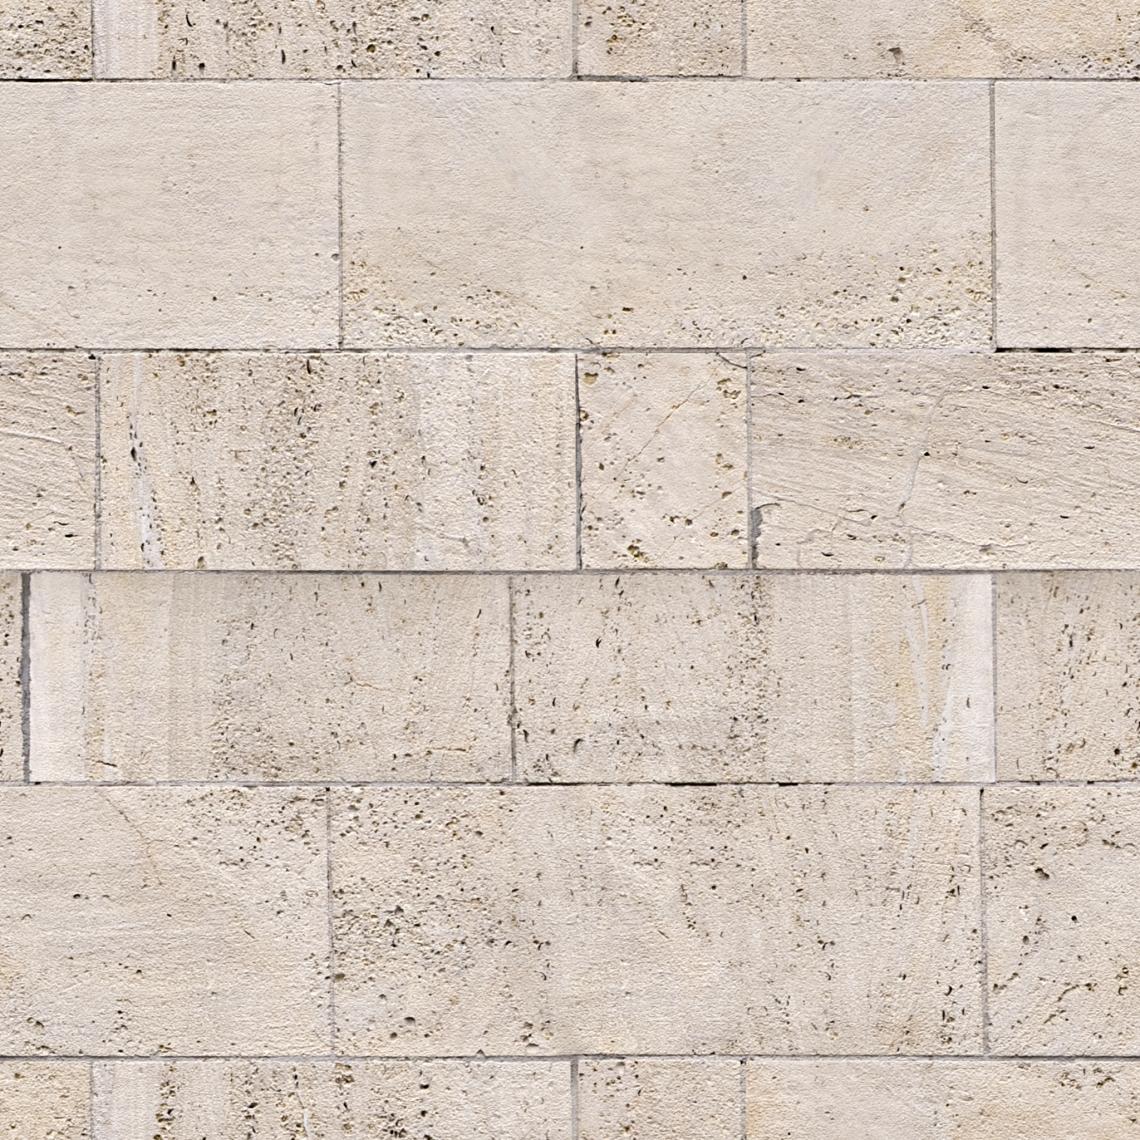 Modern Brick Construction in Architecture | Architectoid